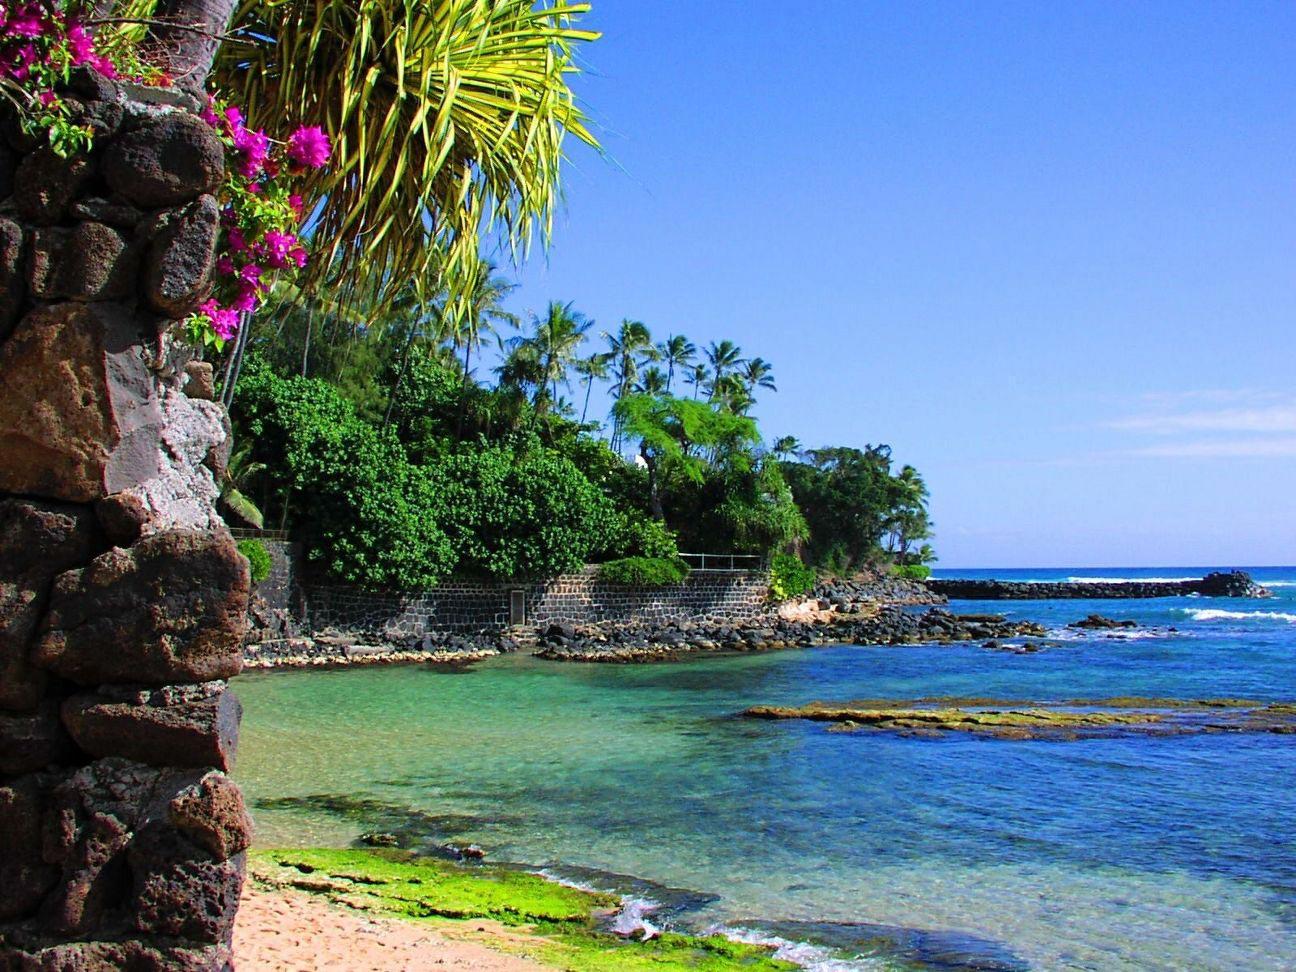 Hawaii Voyage tout compris